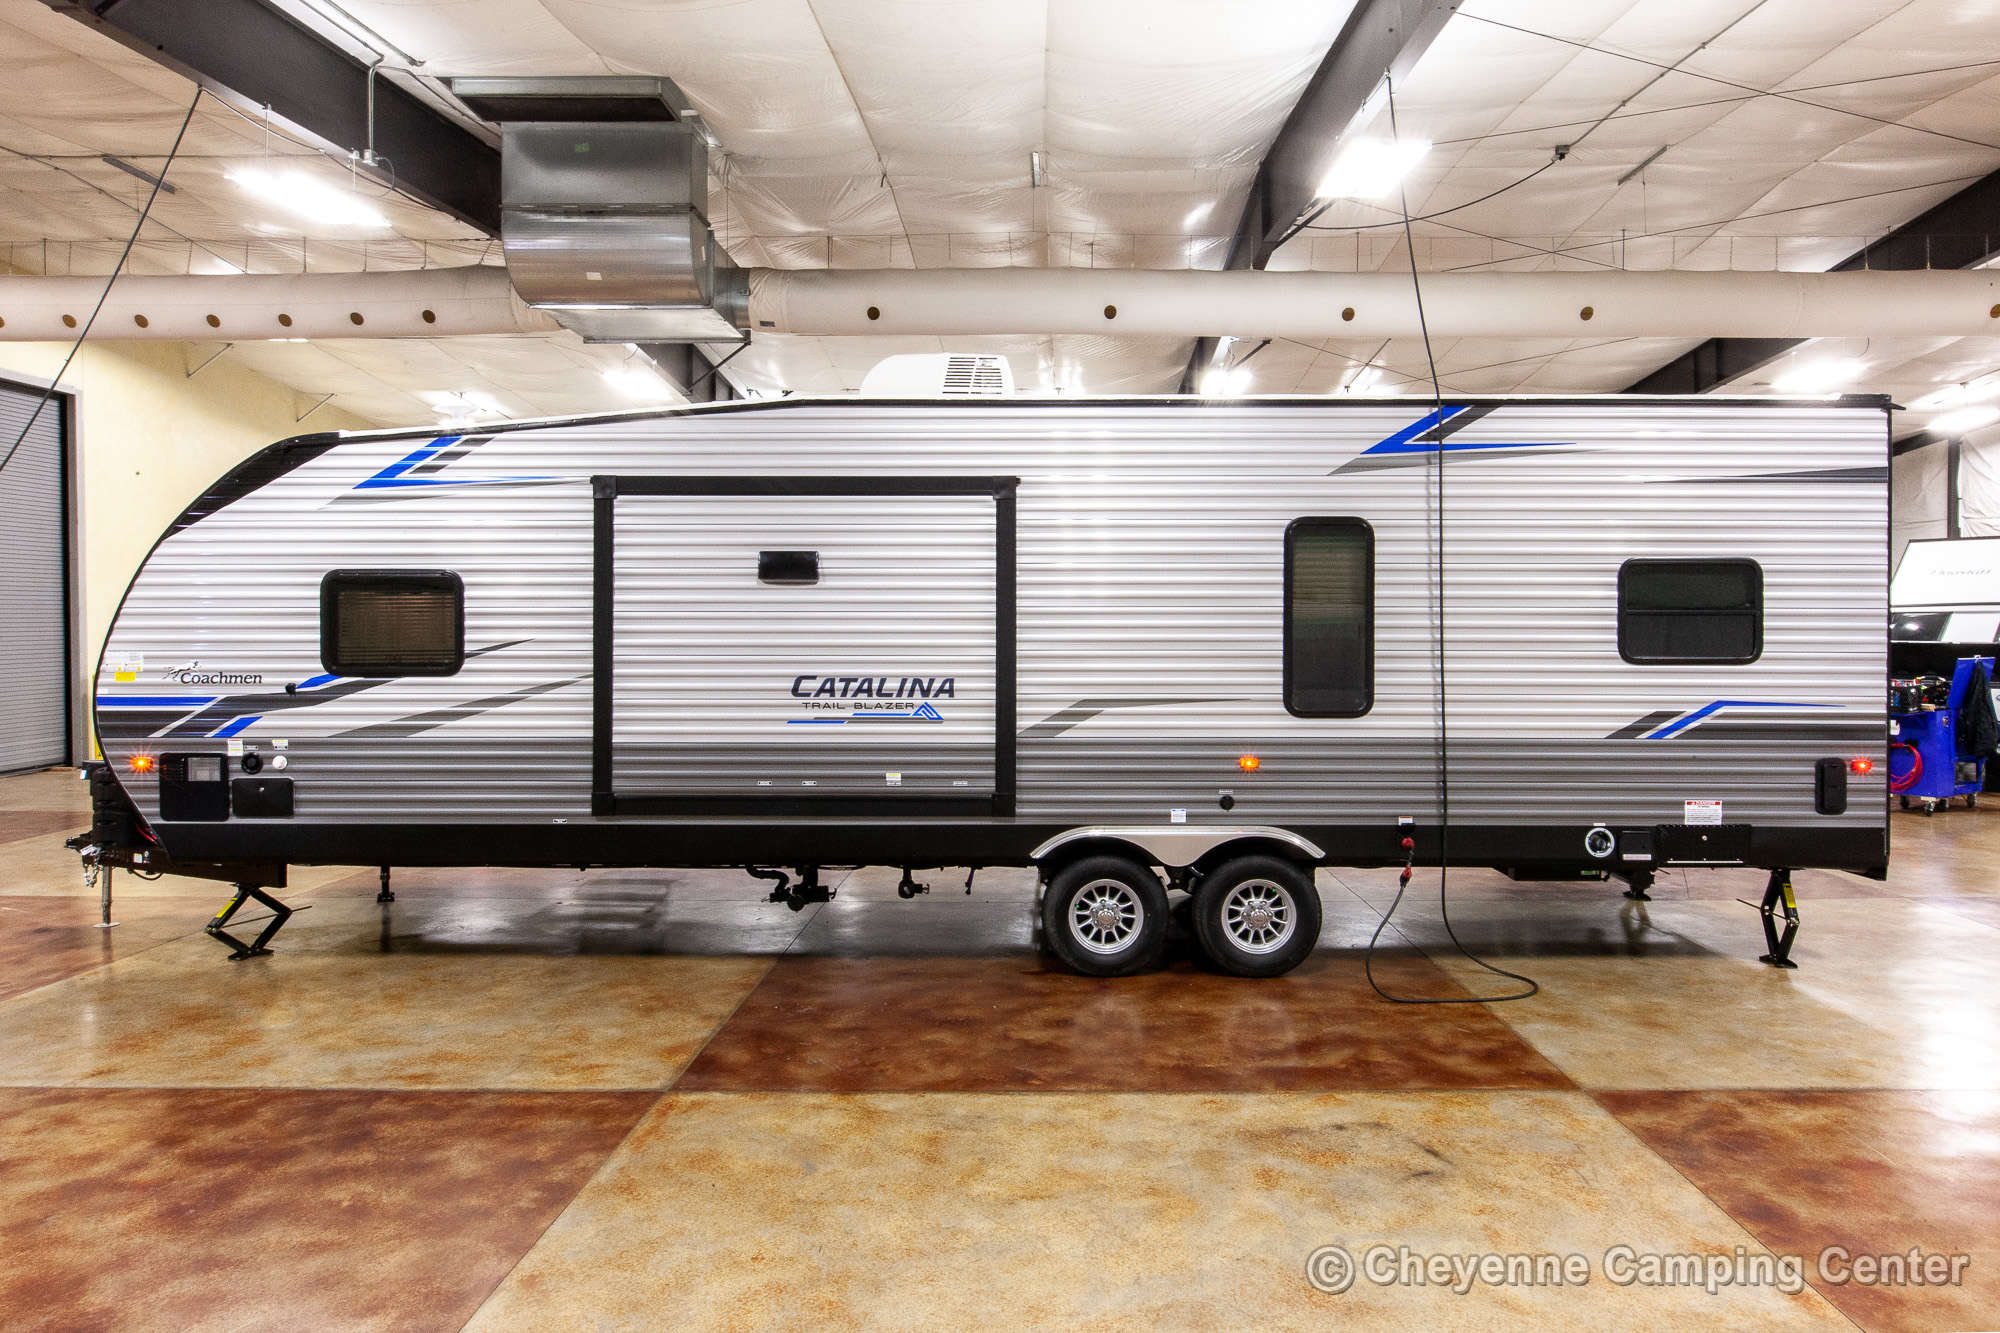 2021 Coachmen Catalina Trail Blazer 30THS Bunkhouse Toy Hauler Travel Trailer Exterior Image